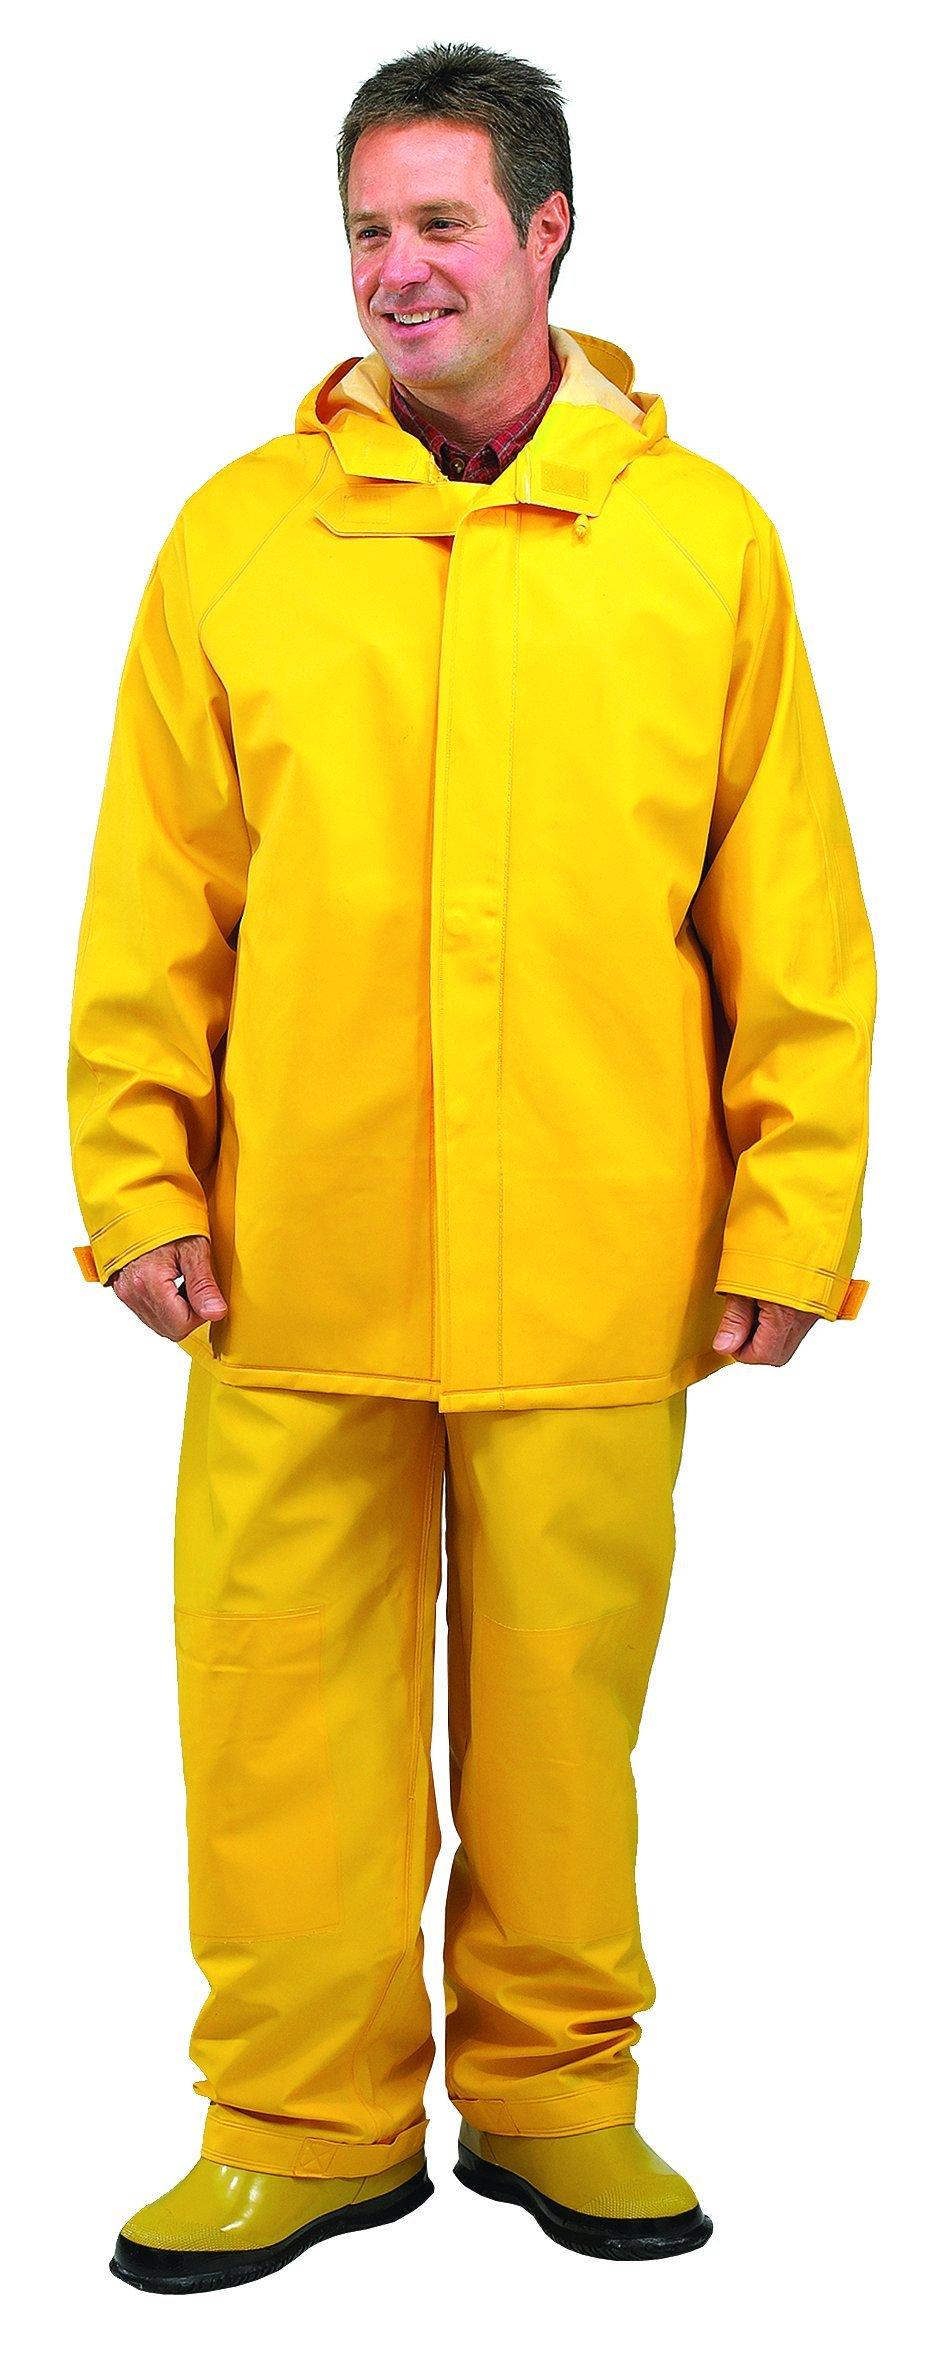 Galeton 7953-XL-YW 7953 Repel Rainwear 0.50 mm PVC 2-Layer Rain Suit, Yellow, X-Large